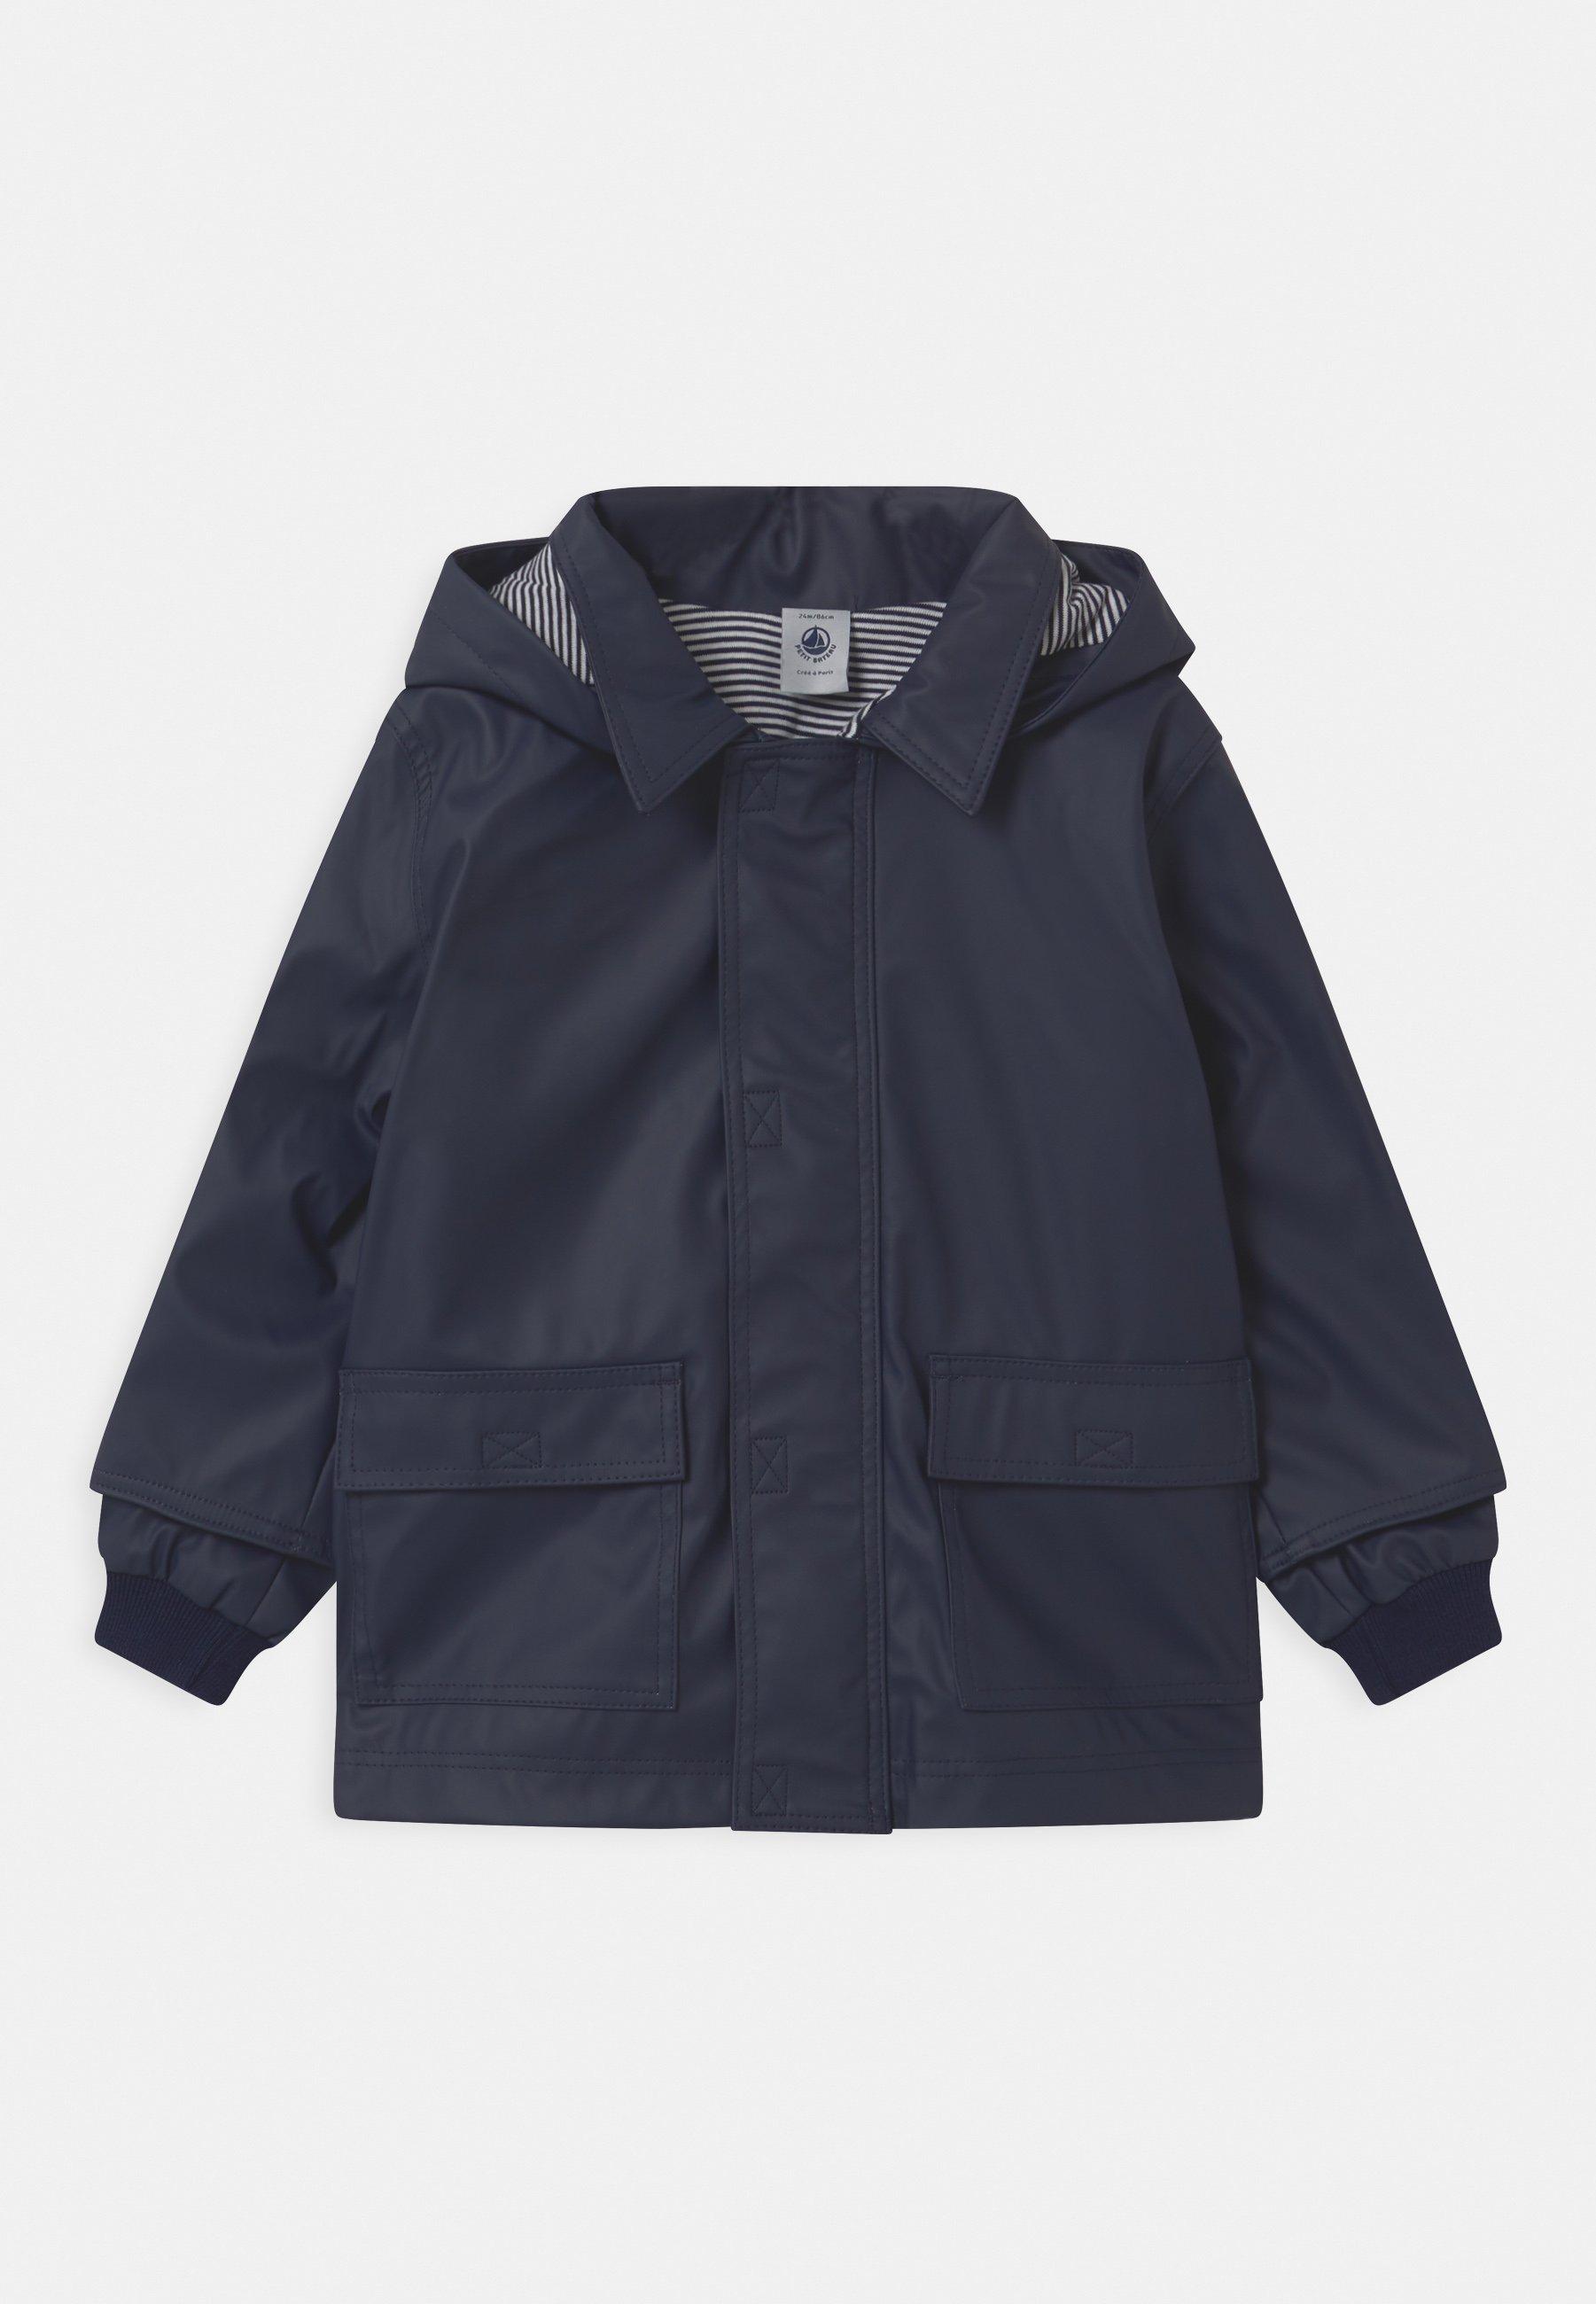 Kinder BABY CIRE JACKET - Regenjacke / wasserabweisende Jacke